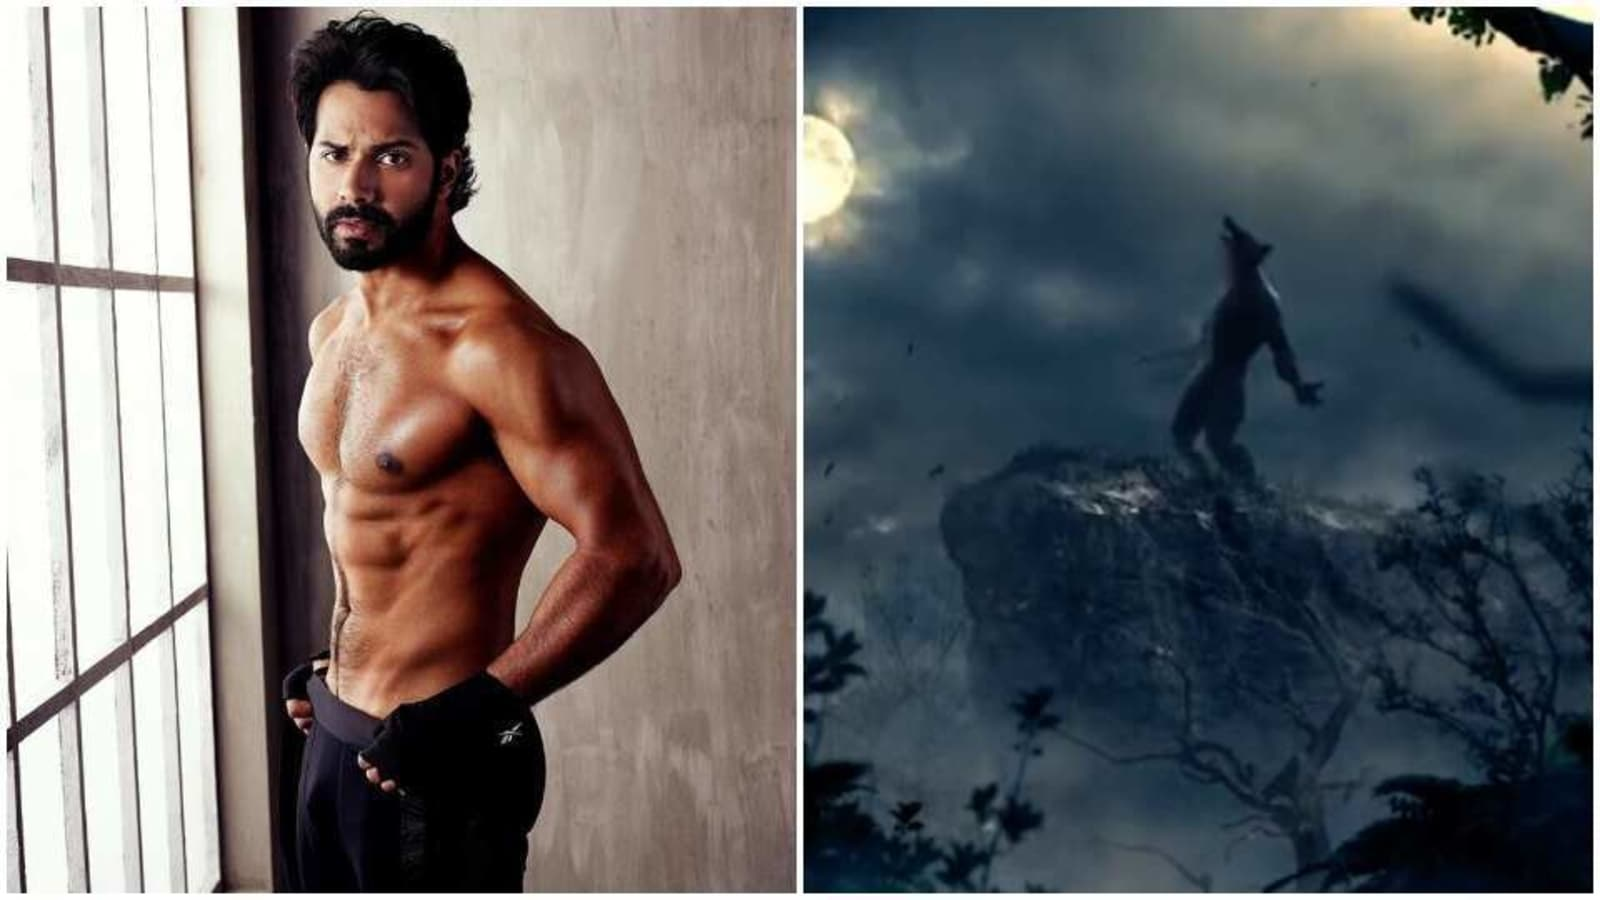 Bhediya teaser: Varun Dhawan turns werewolf, sends 'pranaam' to Stree ji, Roohi ji - Hindustan Times